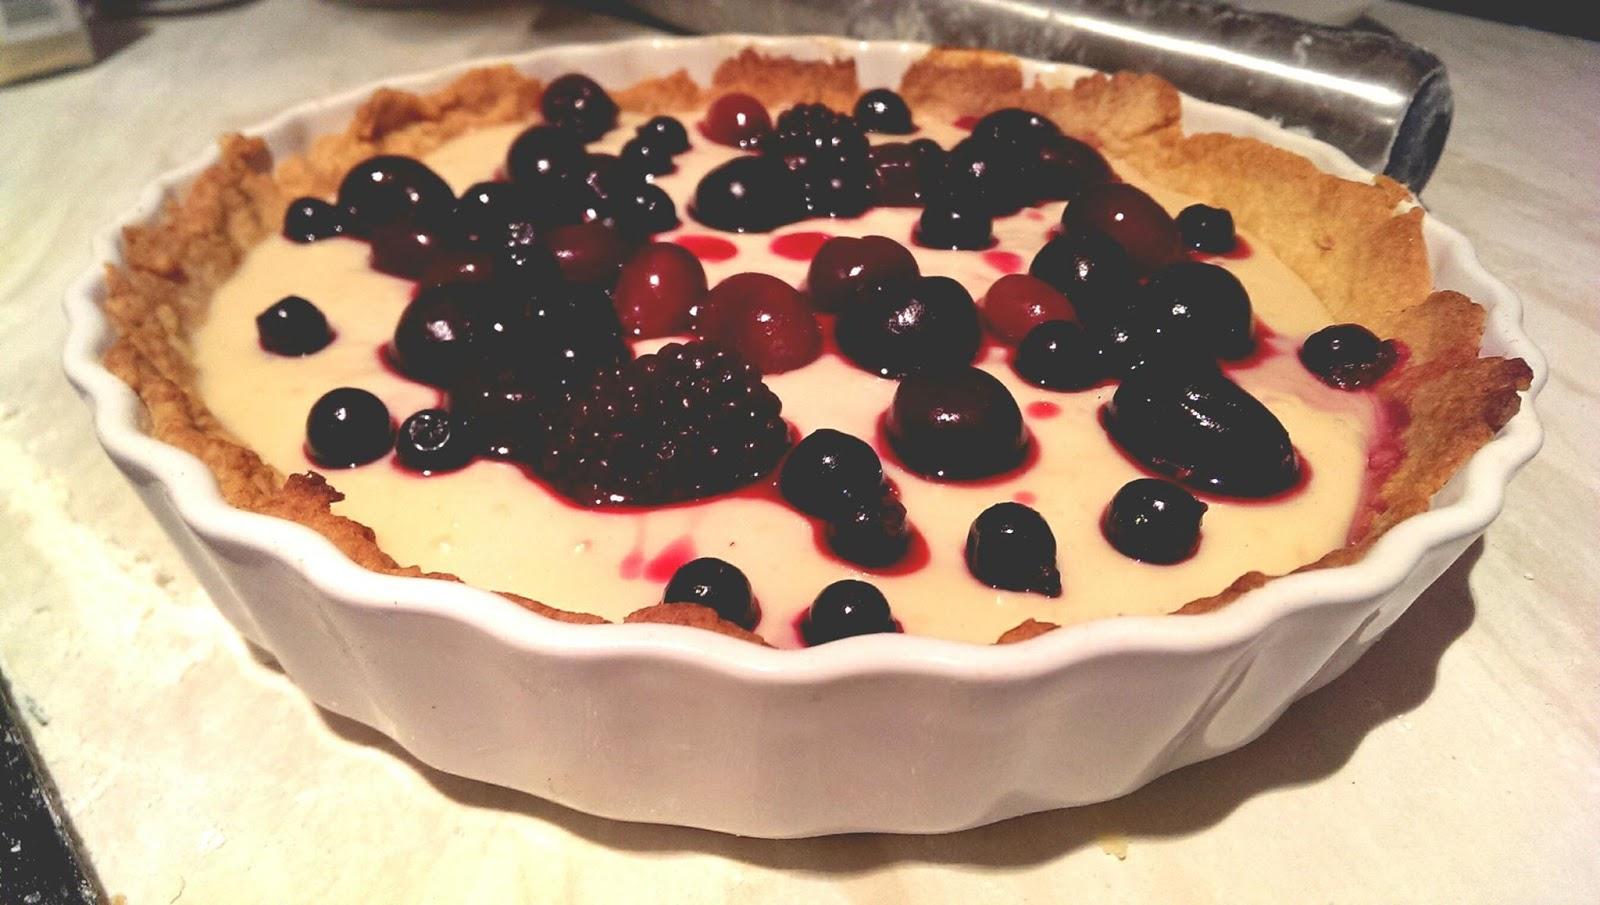 Confectioner's Custard & Forest Fruit Flan Recipe